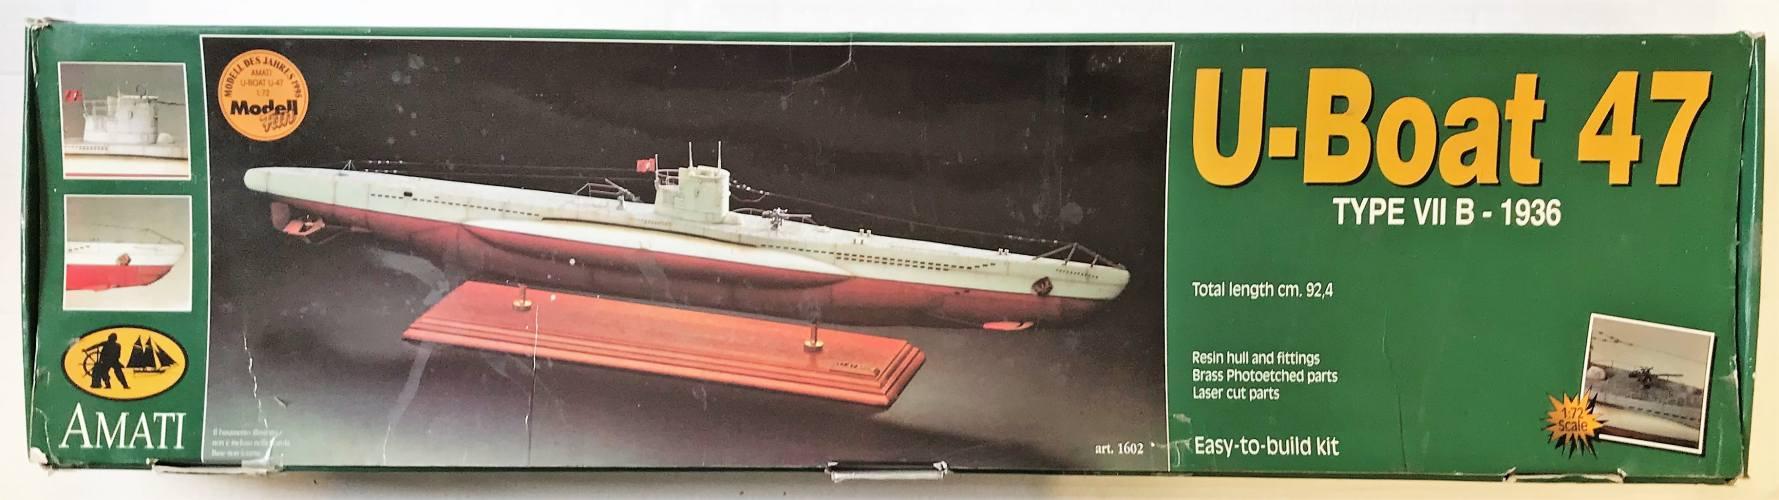 AMATI 1/72 1602 U-BOAT 47 TYPE VII B 1936  UK SALE ONLY